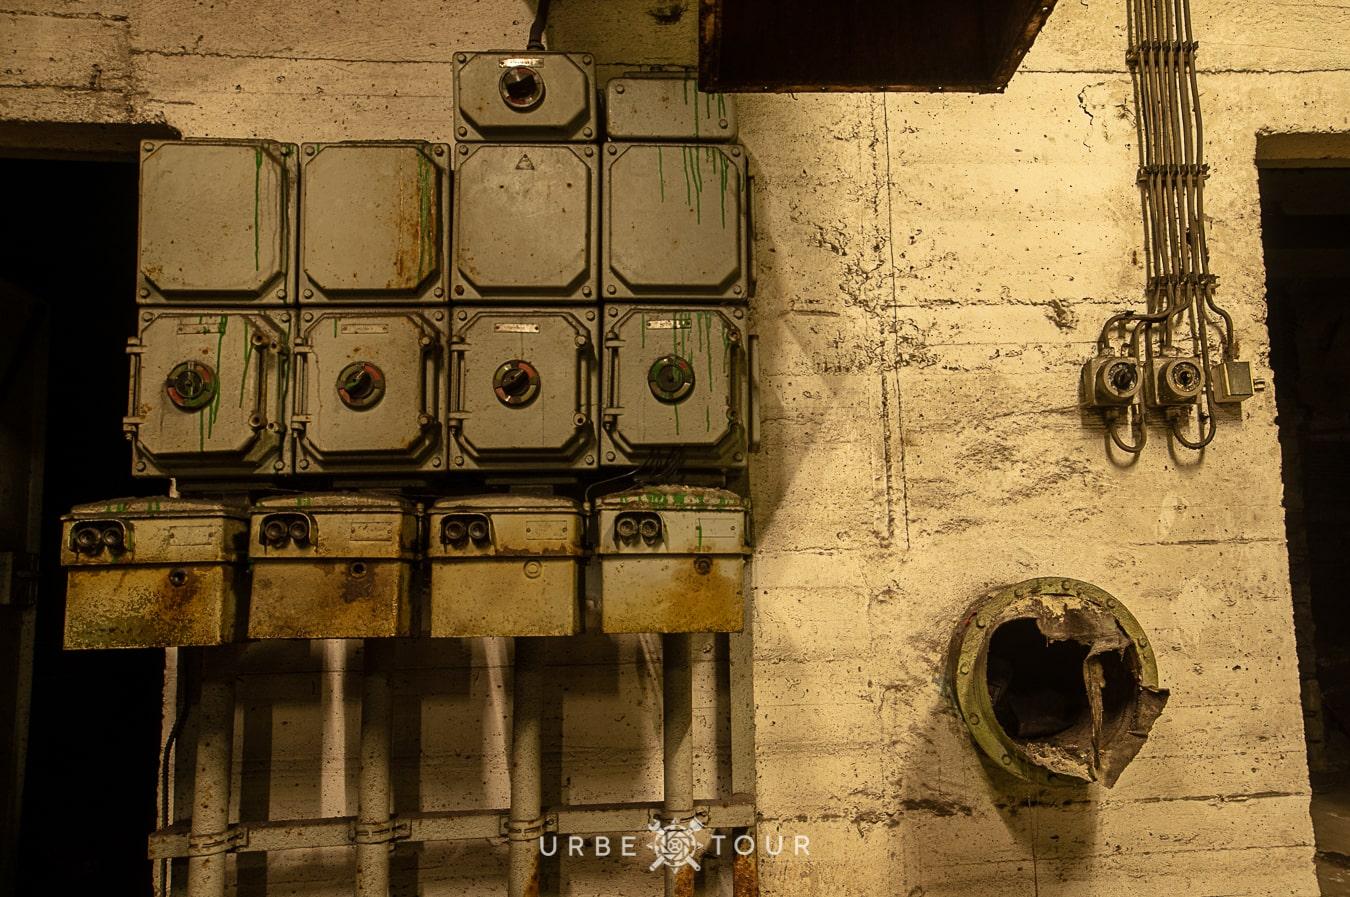 F-4-Rakosi-Bunker-budapest23 Спецобъект Ф-4 - бункер коммуниста Ракоси в центре Будапешта